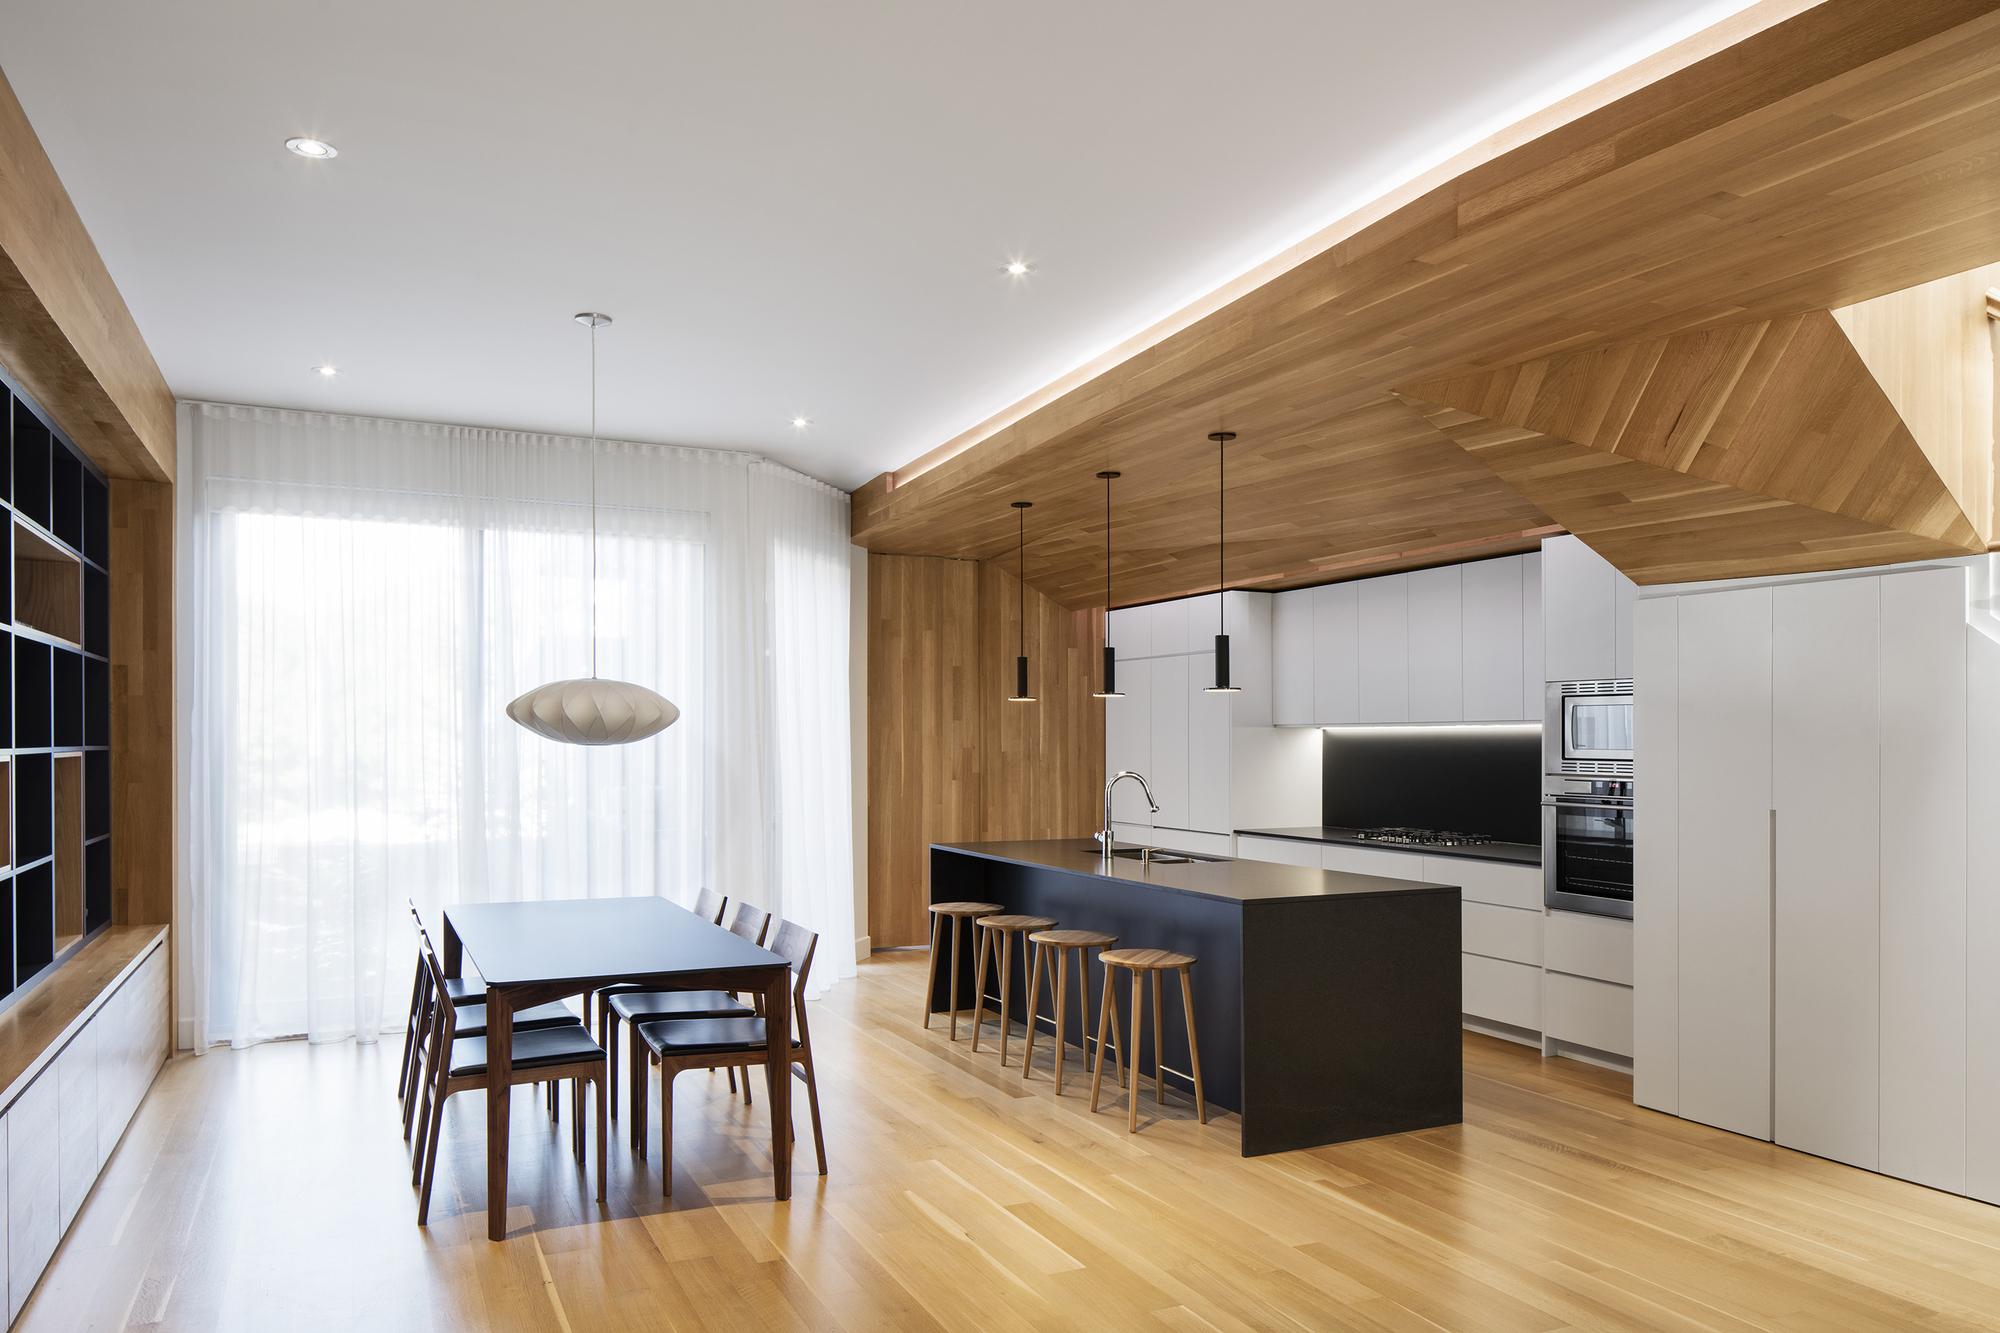 galer a de la casa de paul y sigi mxma architecture design 8. Black Bedroom Furniture Sets. Home Design Ideas